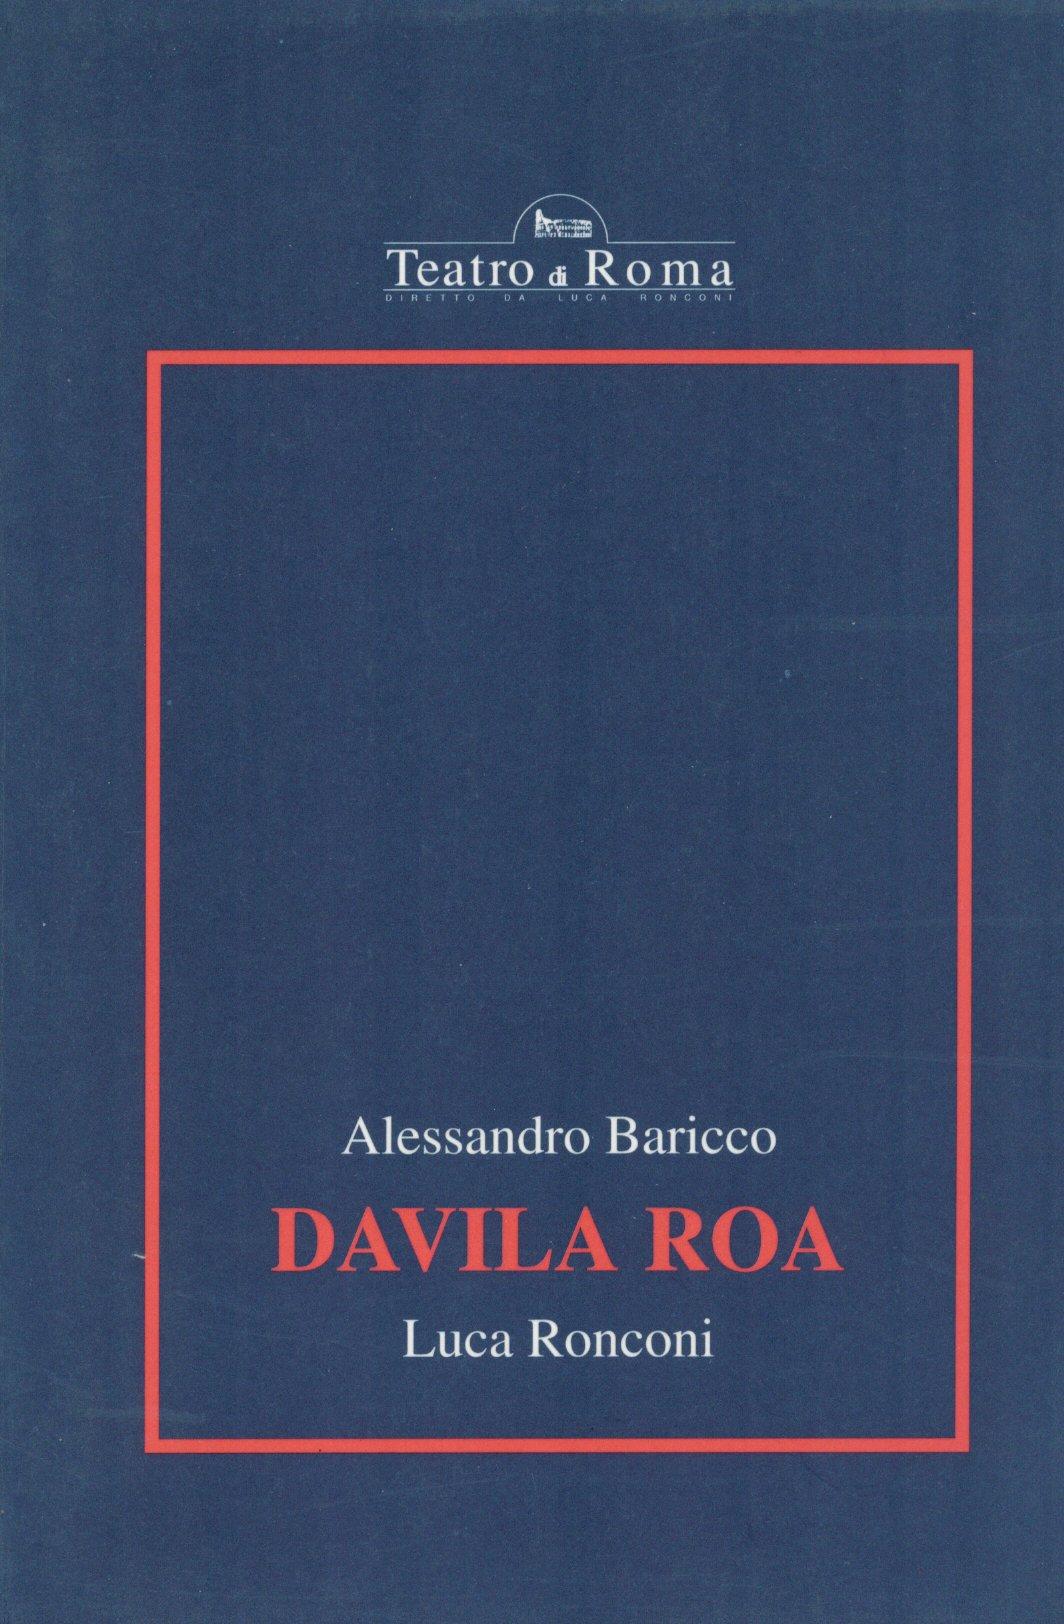 Davila Roa